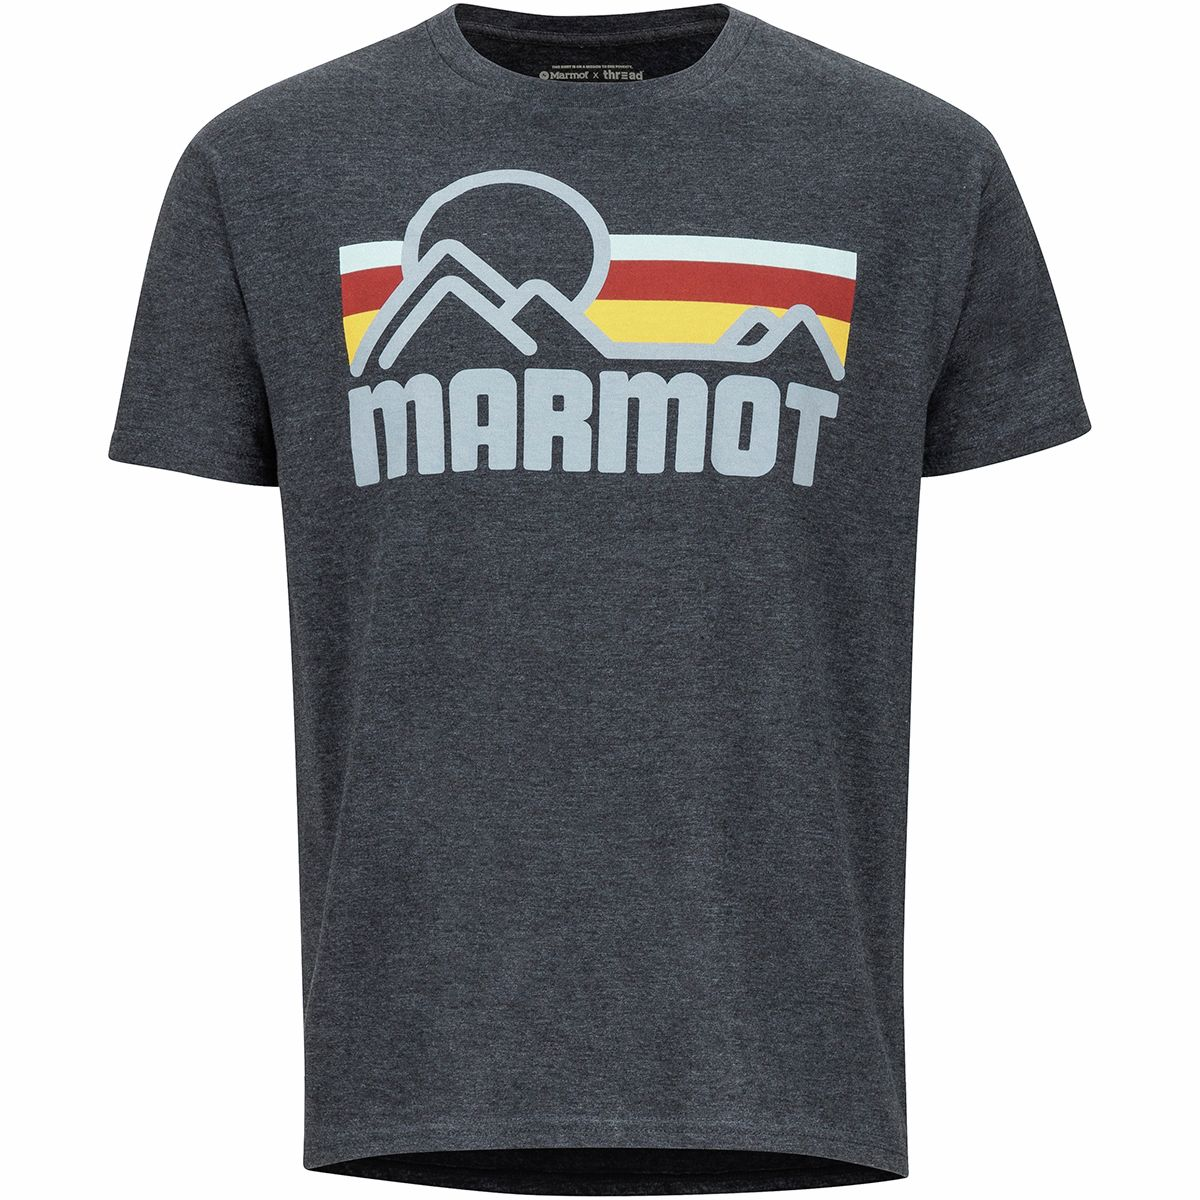 Coastal Short-Sleeve T-Shirt - Men